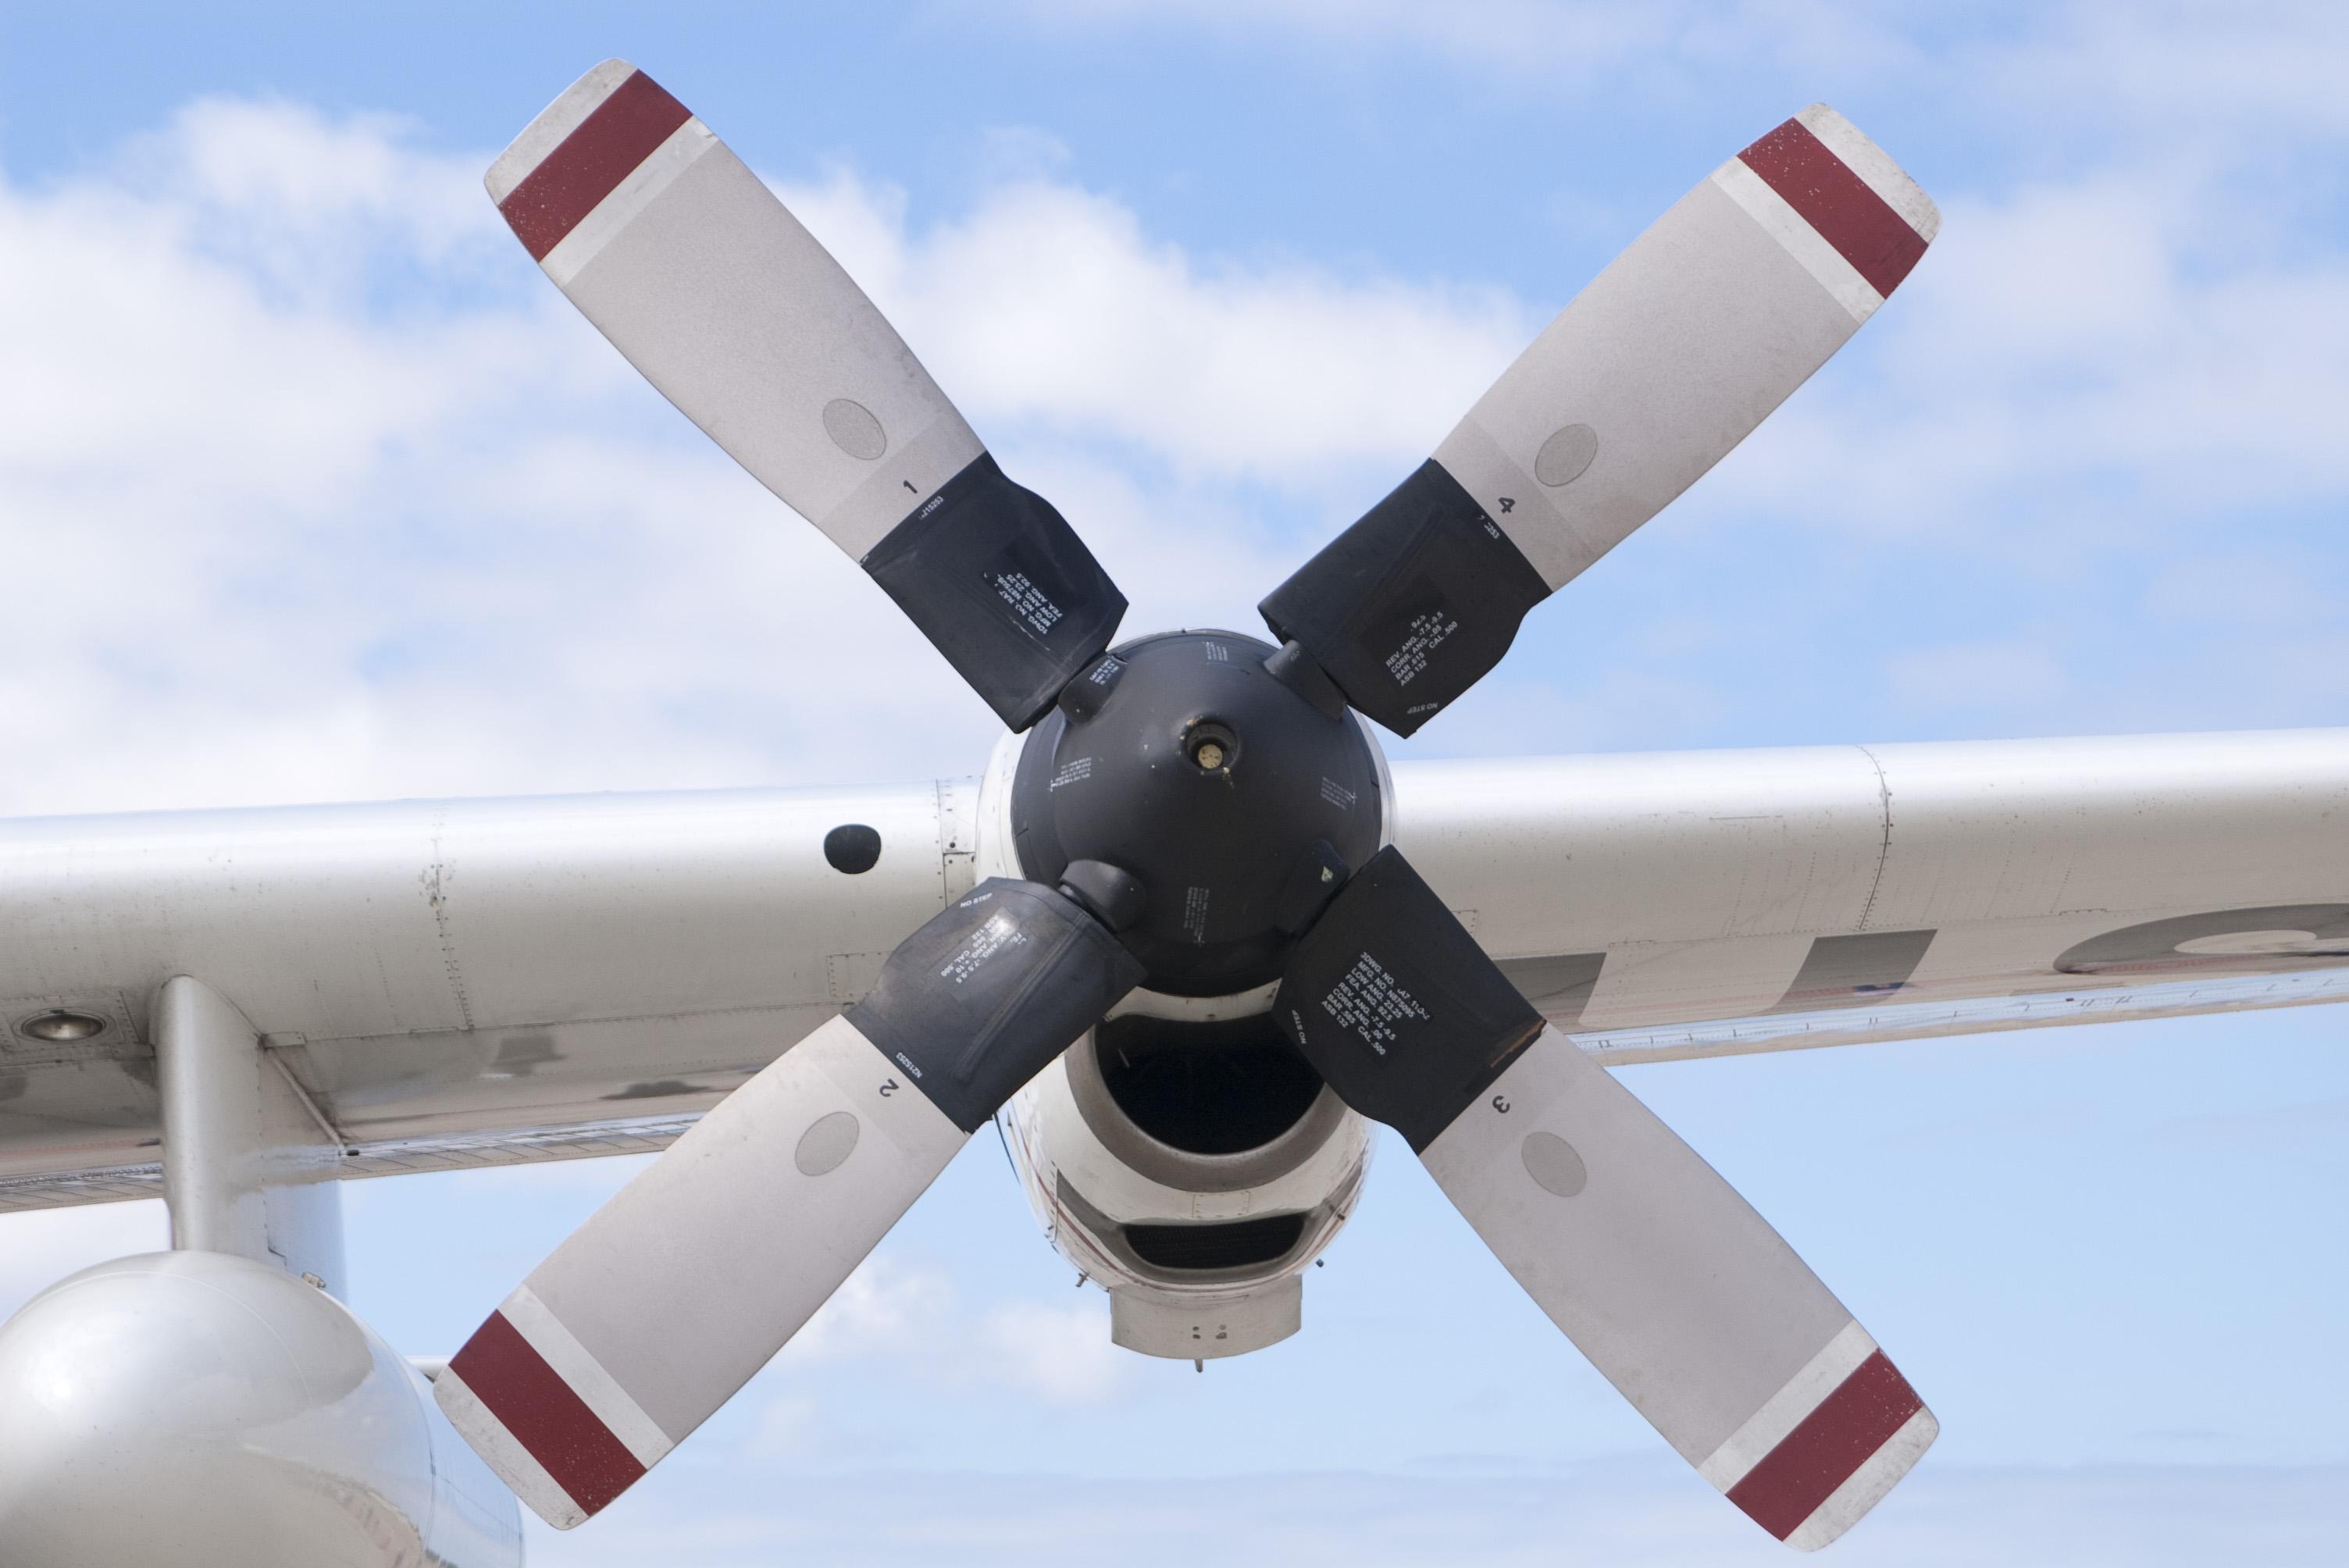 Free Stock Photo 2315-HC-130 Hercules Propeller | freeimageslive